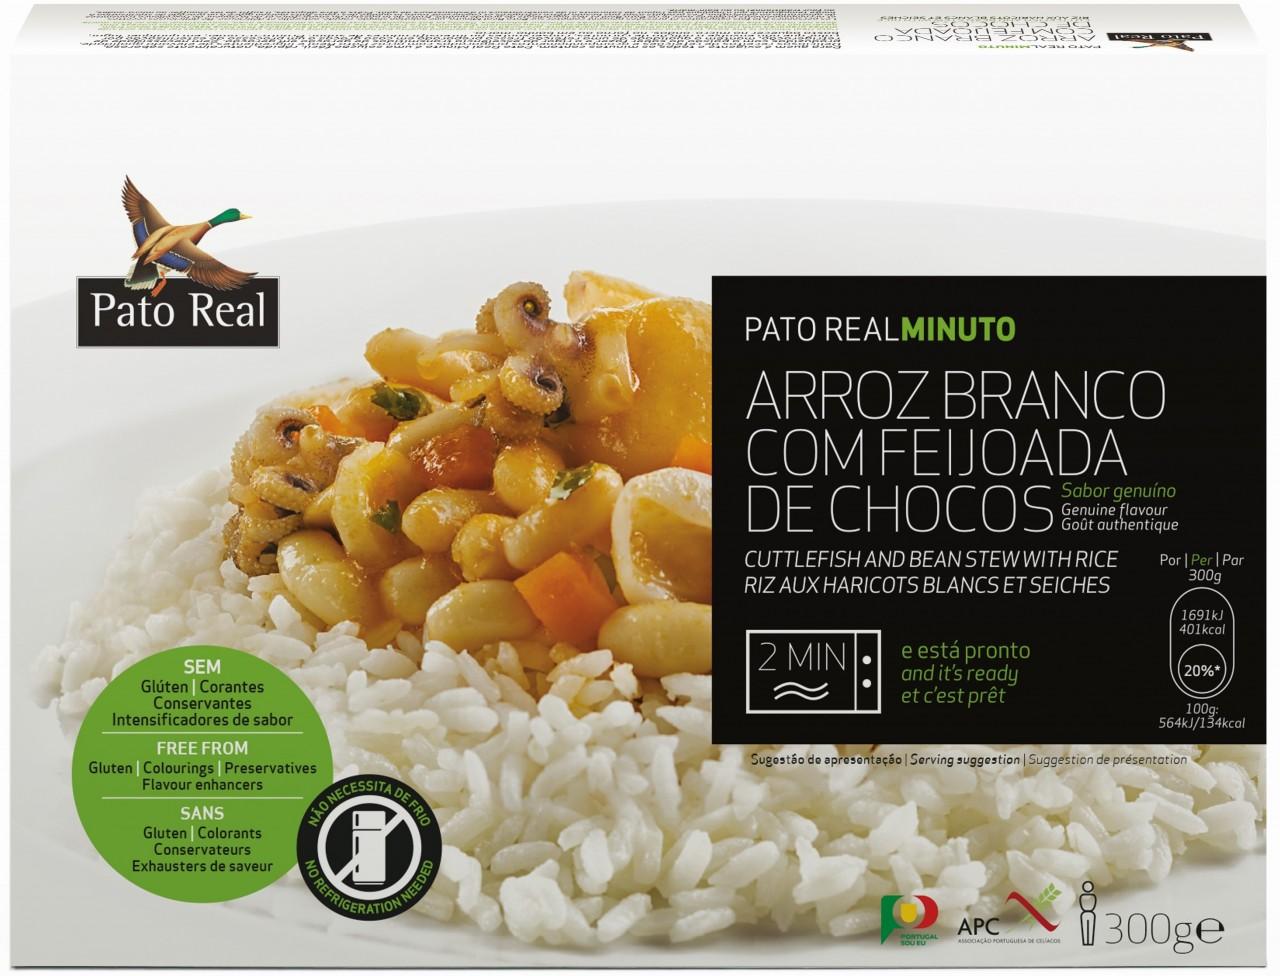 Reisgericht mit Tintenfisch - Arroz Branco com Feijoada de Chocos 300gr. - Pato Real